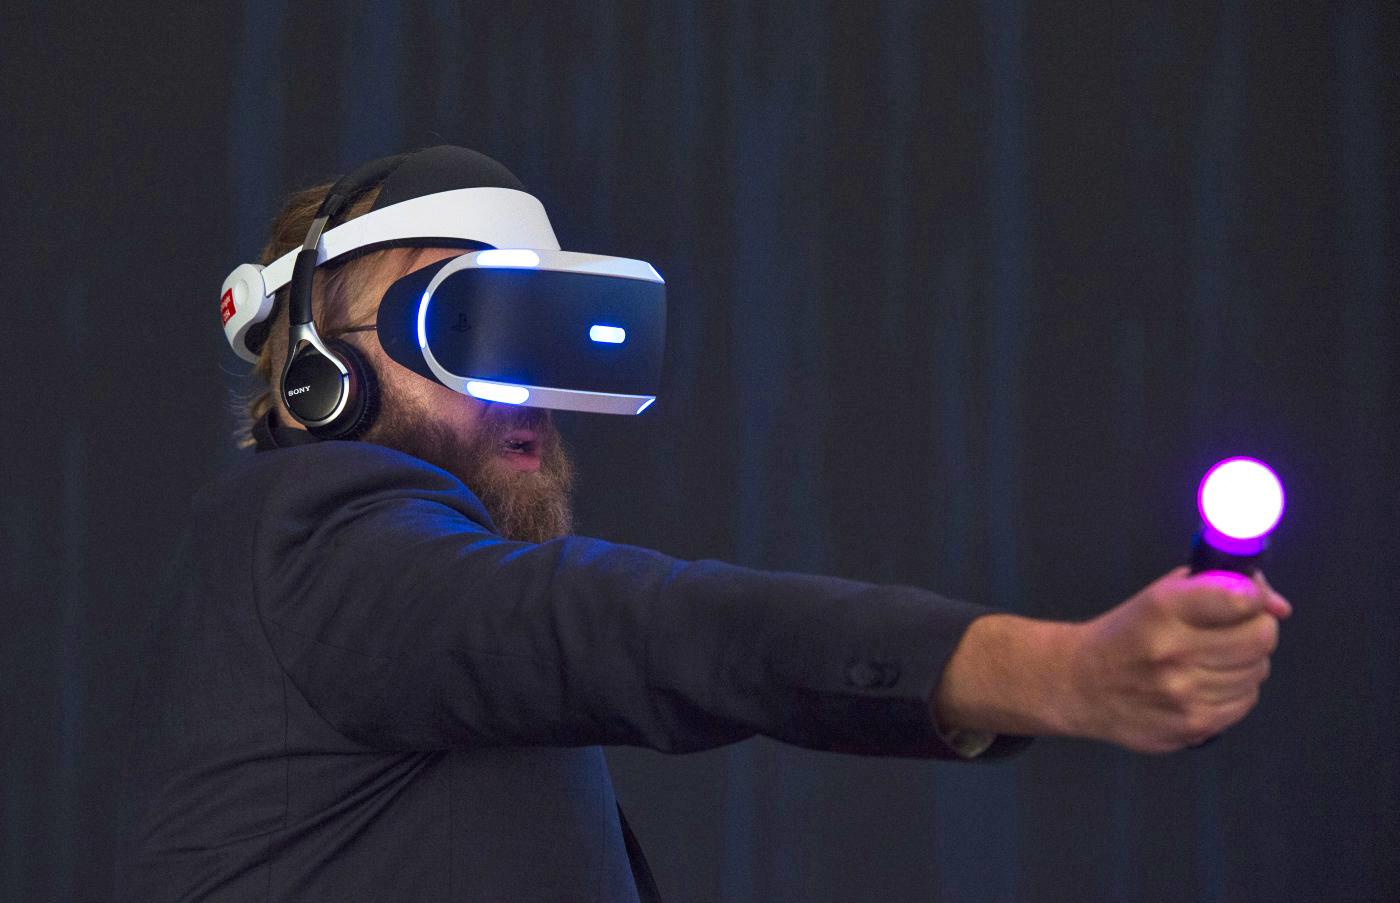 GameStop CEO: PlayStation VR will ship this fall